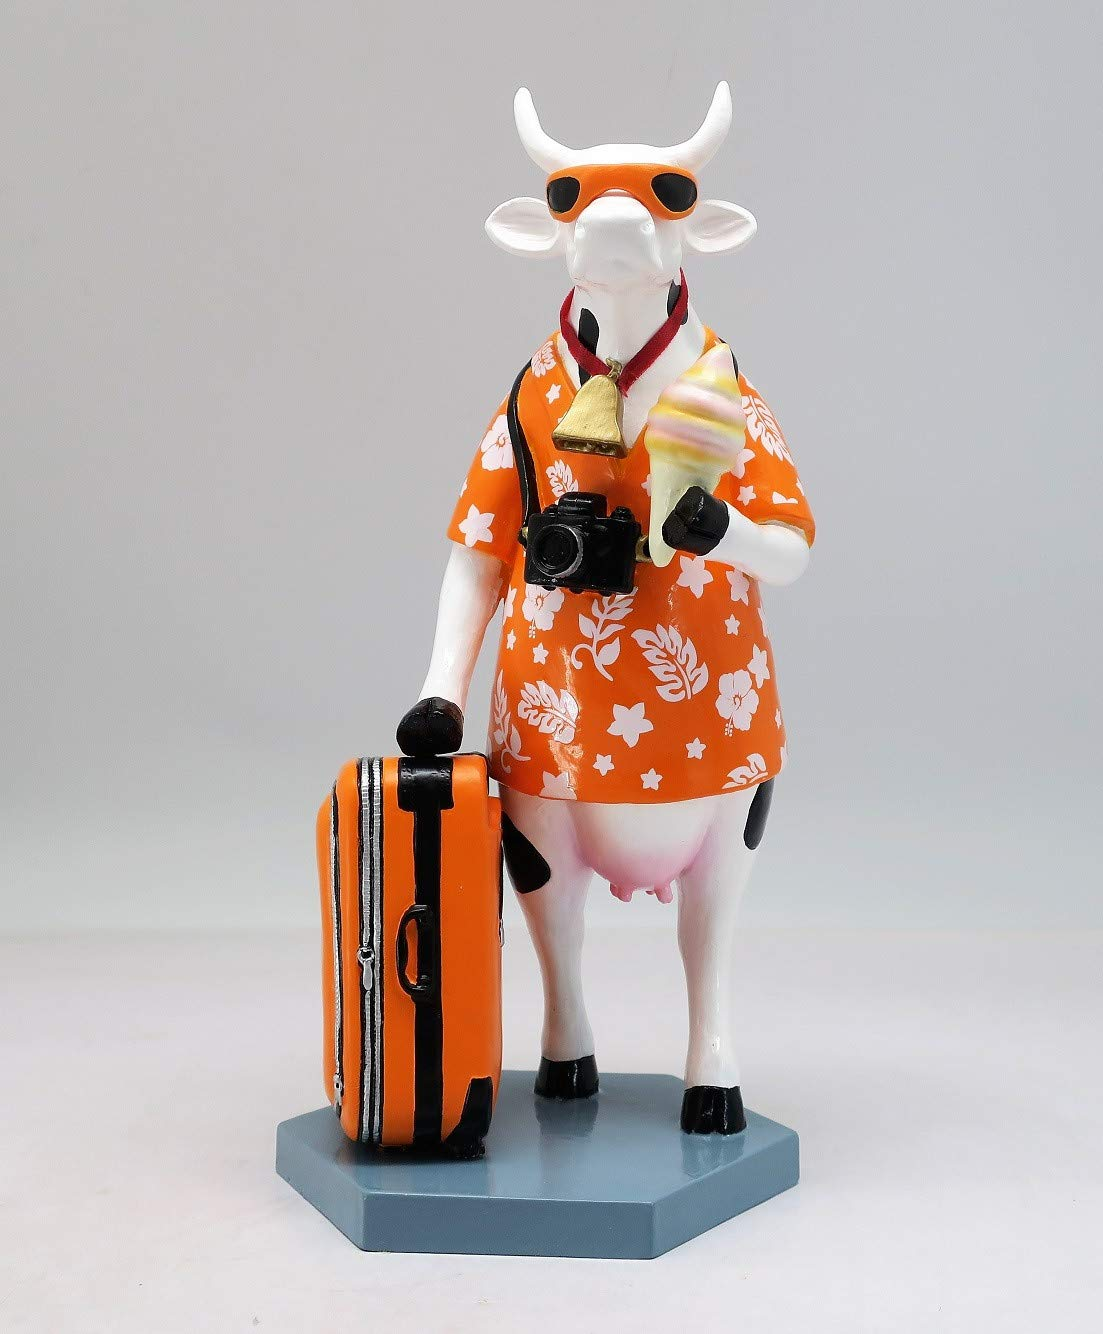 Cowparade Kuh - Vacation Cow (M) - Urlaubskuh, Resin, 15cm, 47908